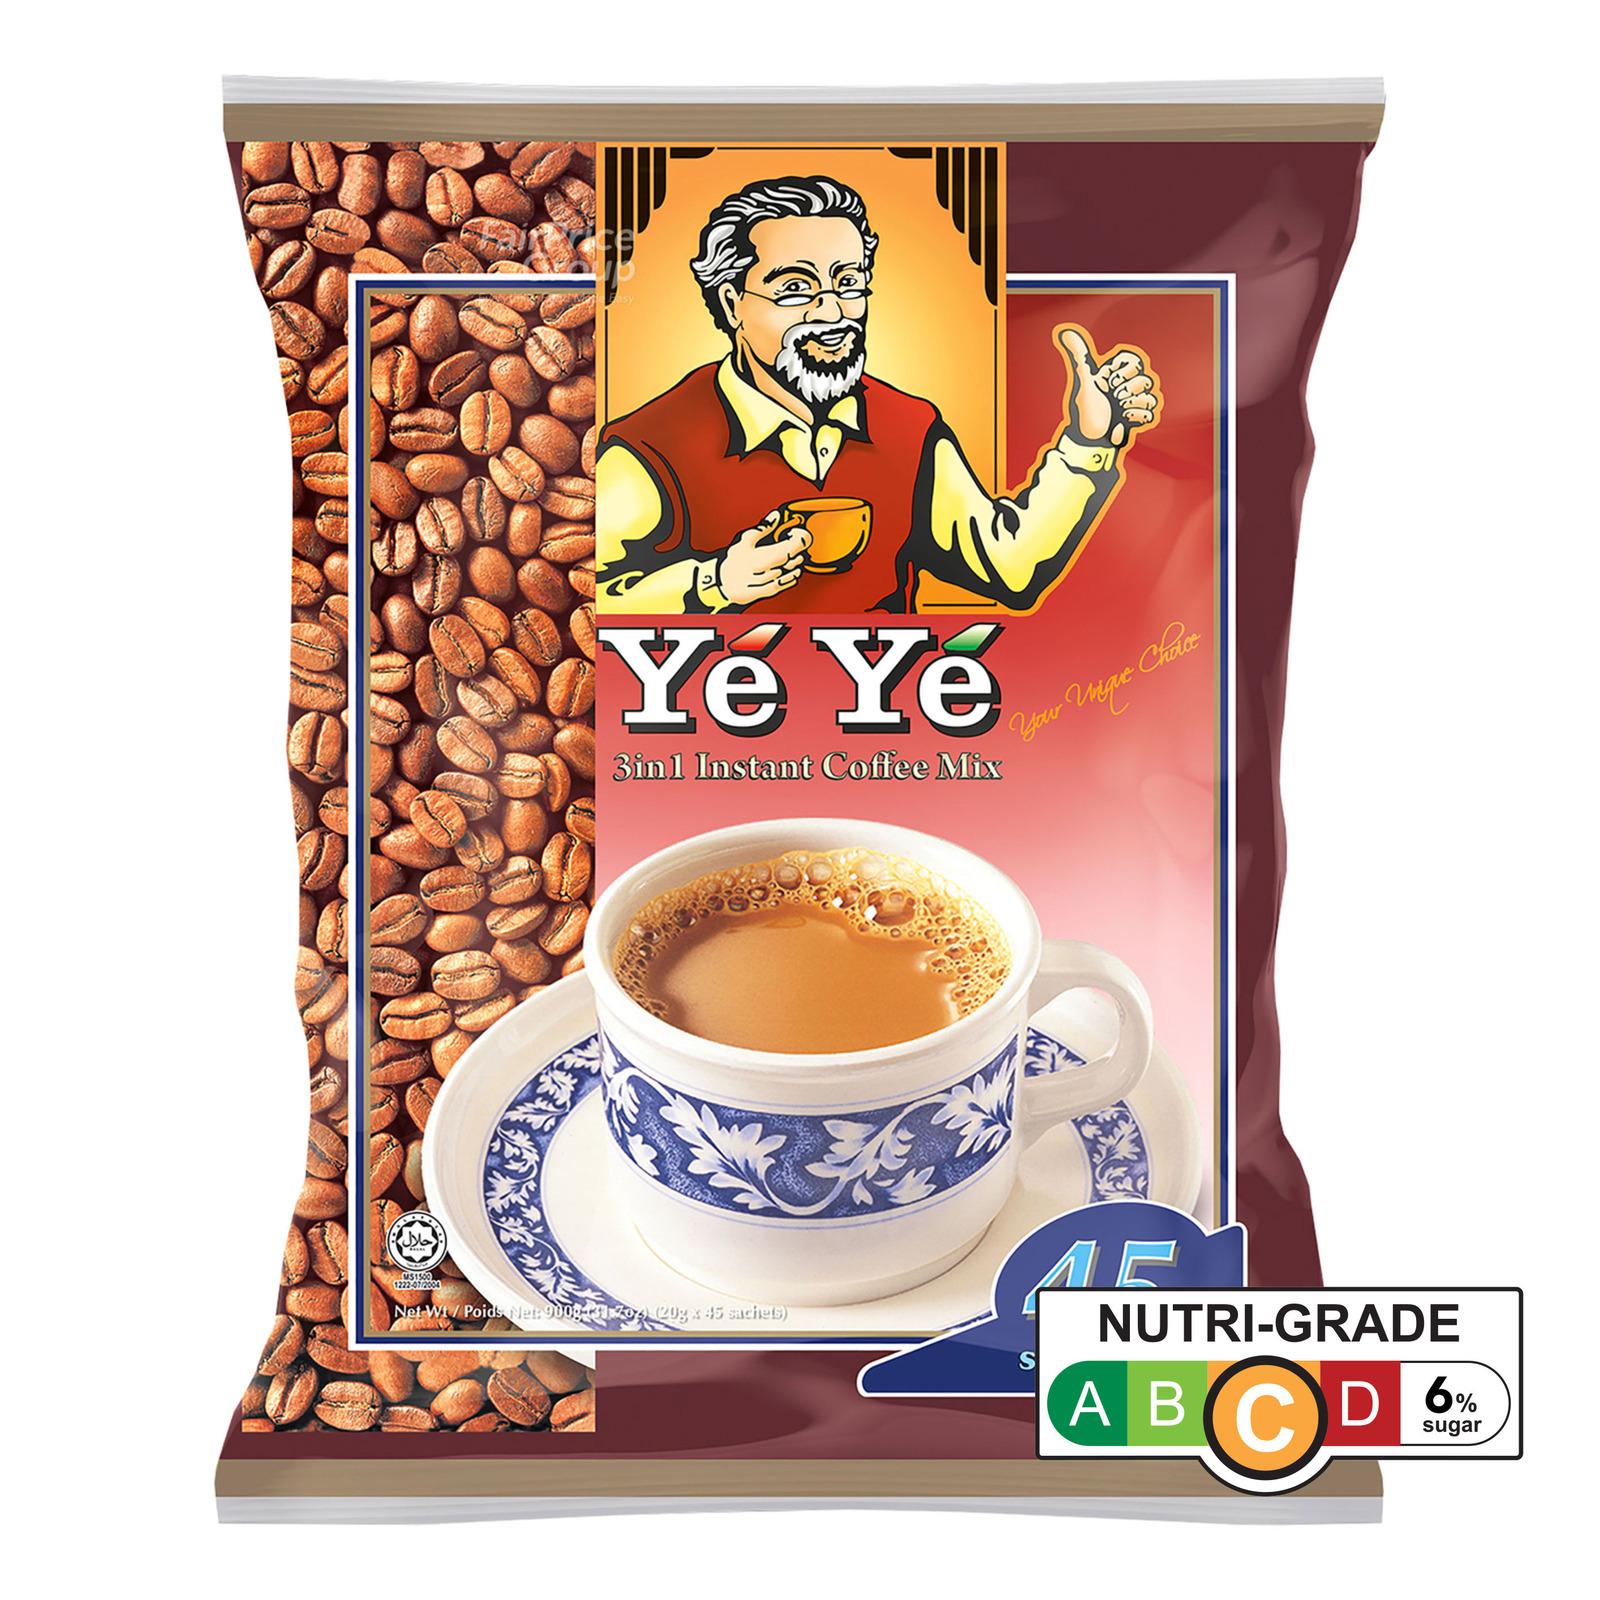 Ye Ye 3 in 1 Instant Coffee Mix - Regular